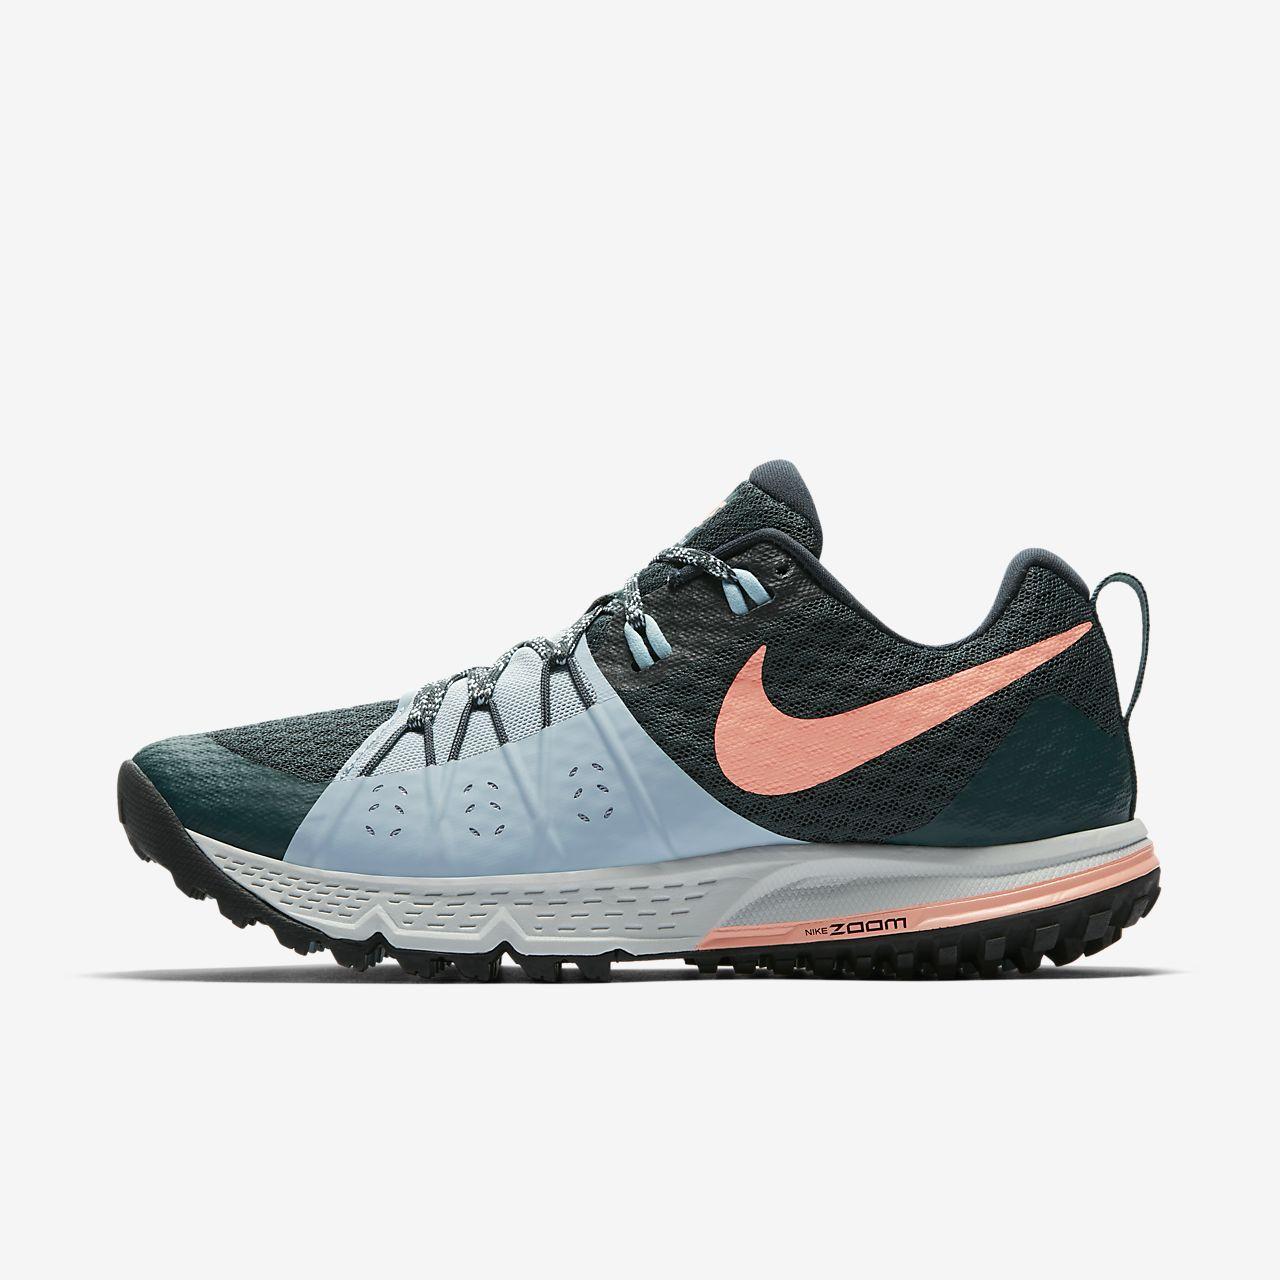 b19c0ee806d97 scarpe trail running nike